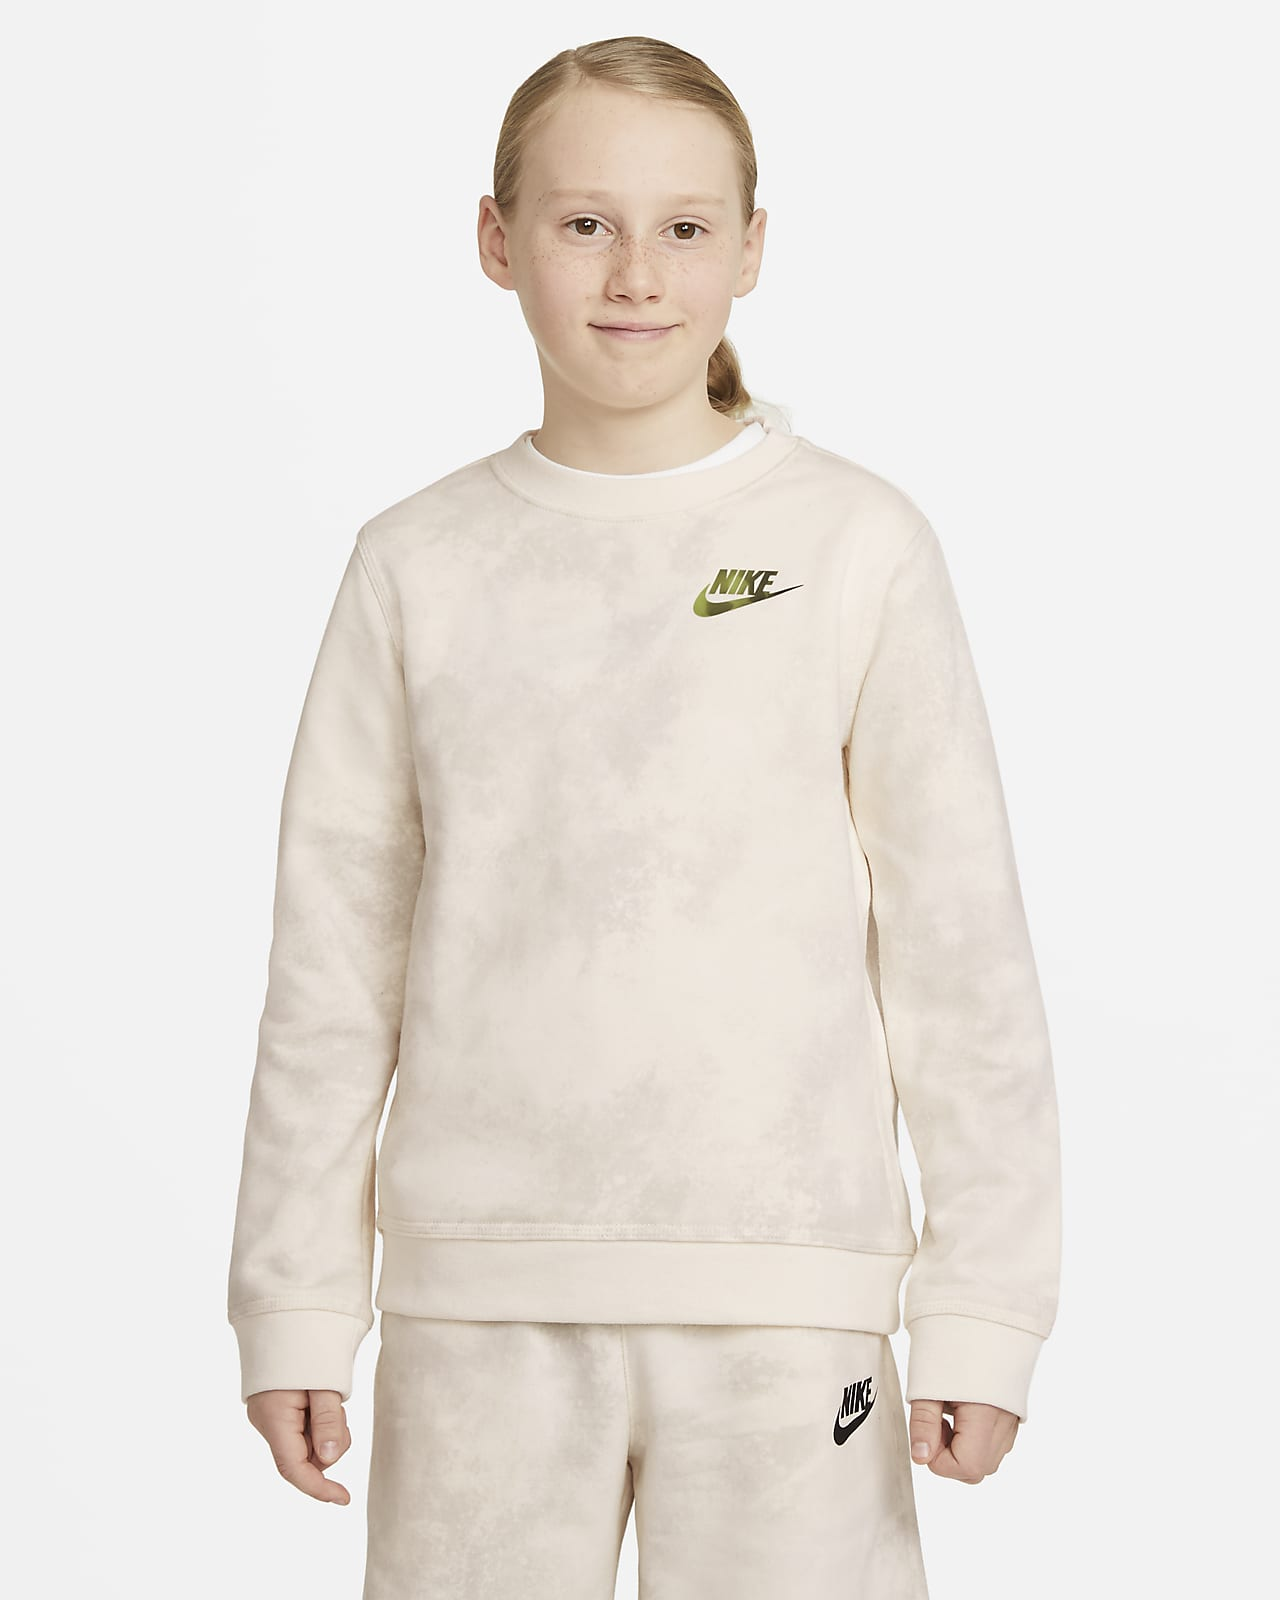 Nike Sportswear Magic Club Dessuadora tenyida de coll rodó - Nen